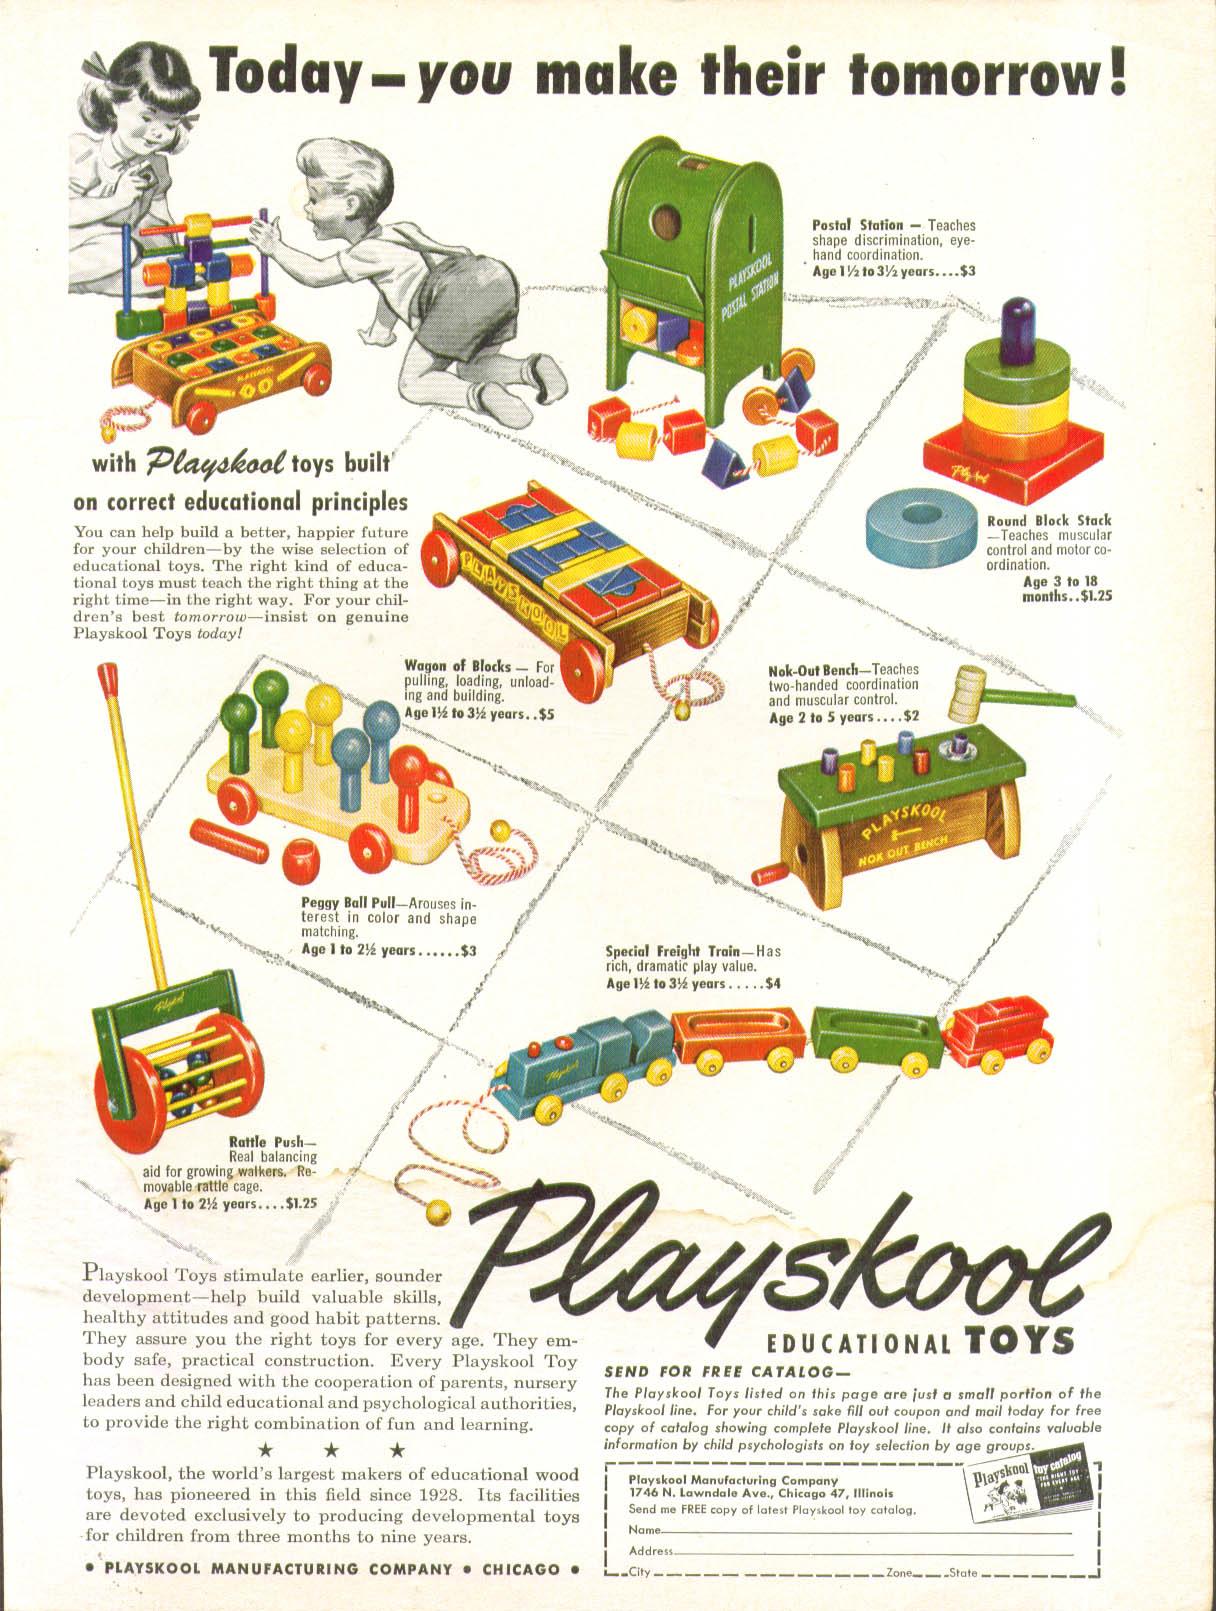 Today you make their tomorrow Playskool ad 1952 train mailbox workbench wagon